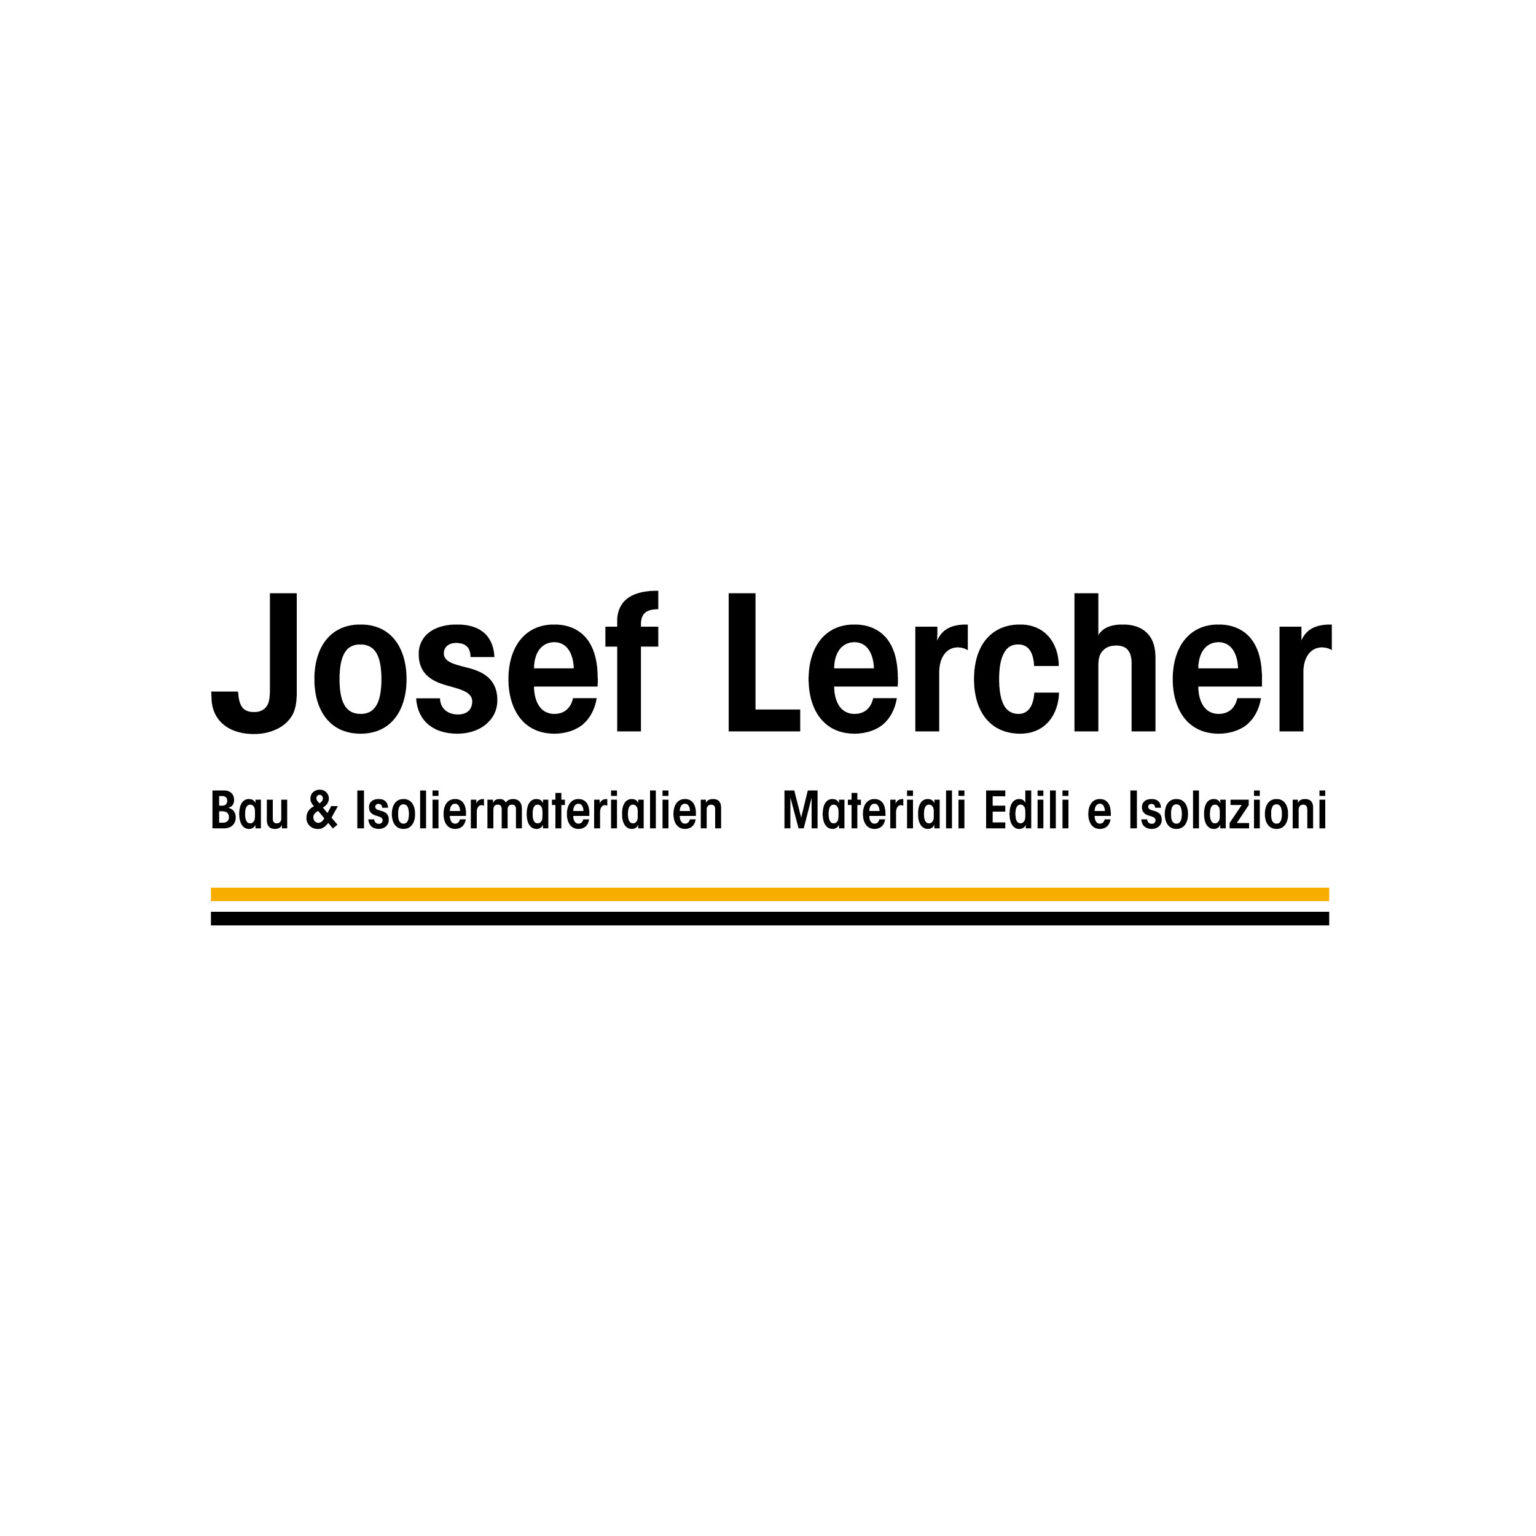 josef lercher logo